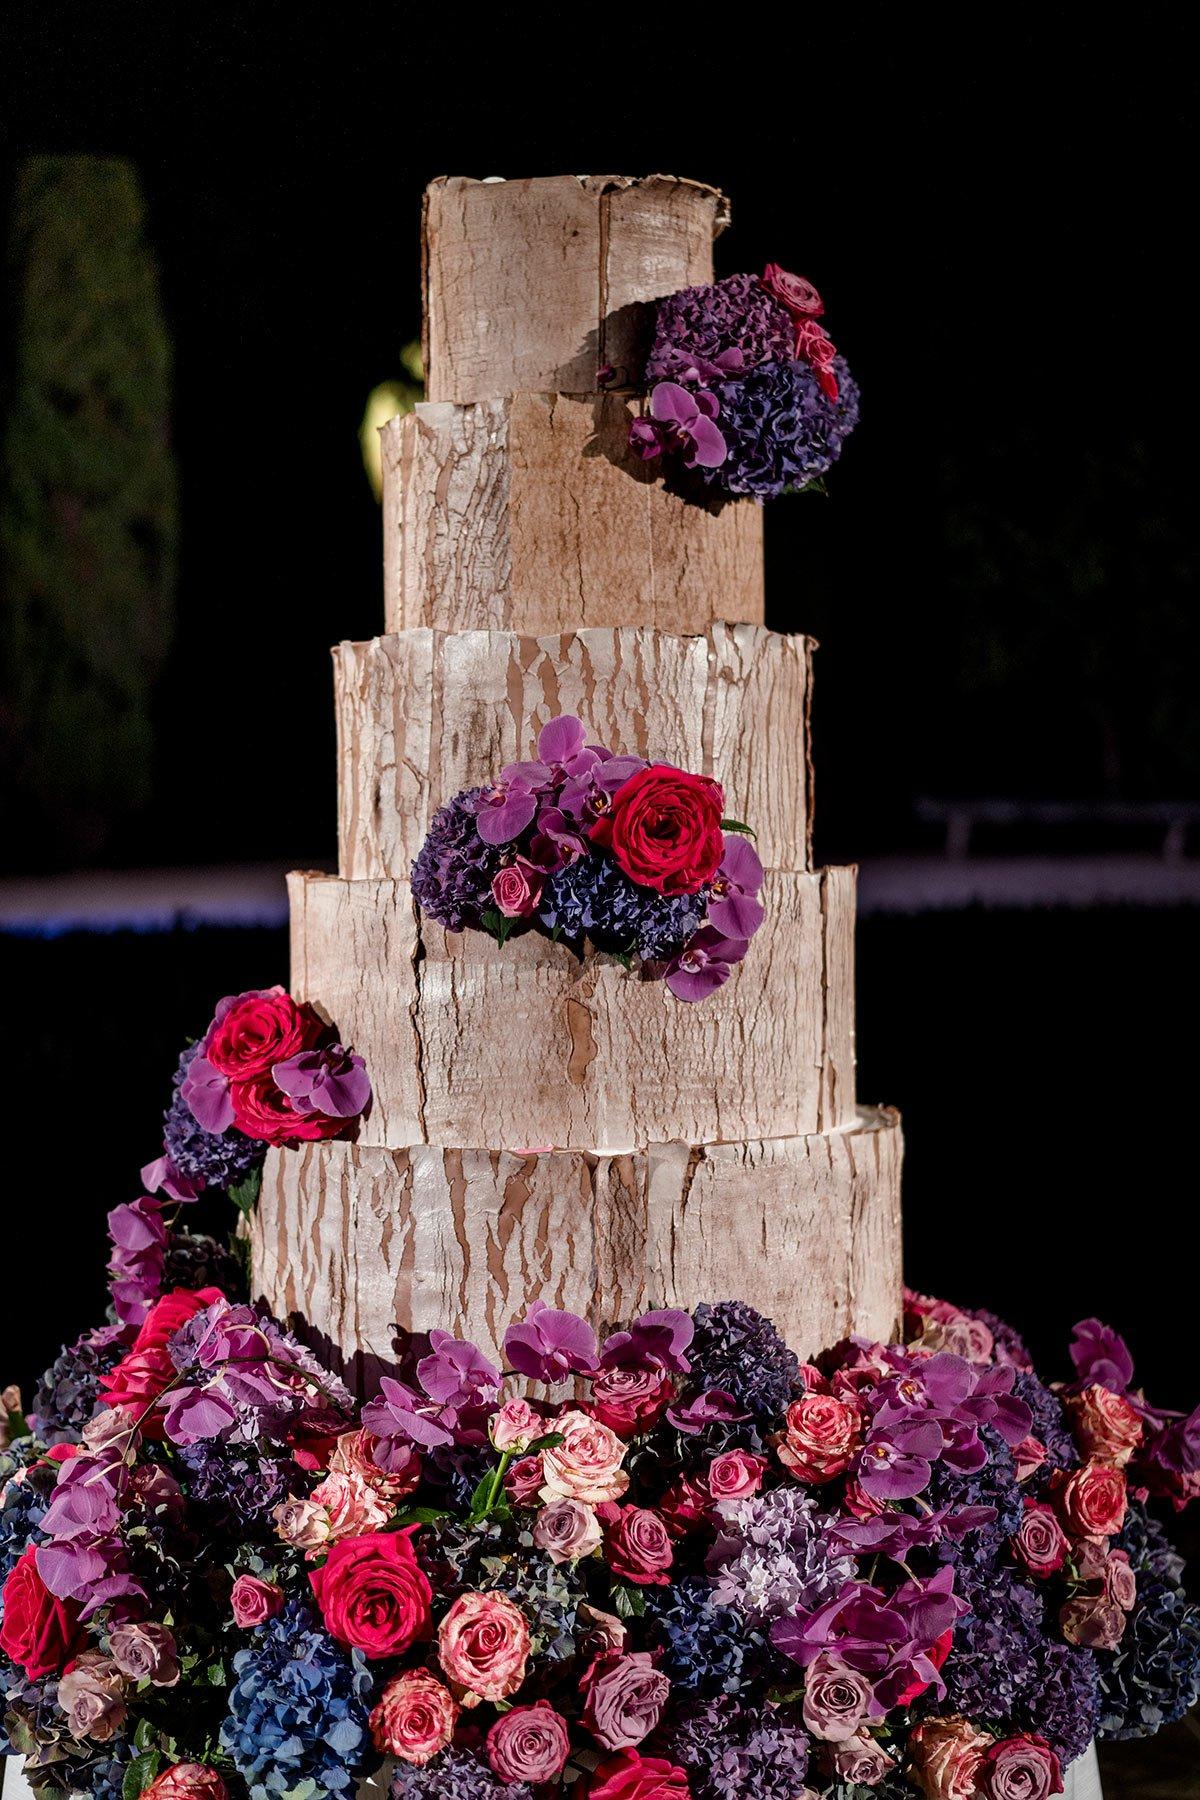 Ranya and Tarek, great wedding cake design